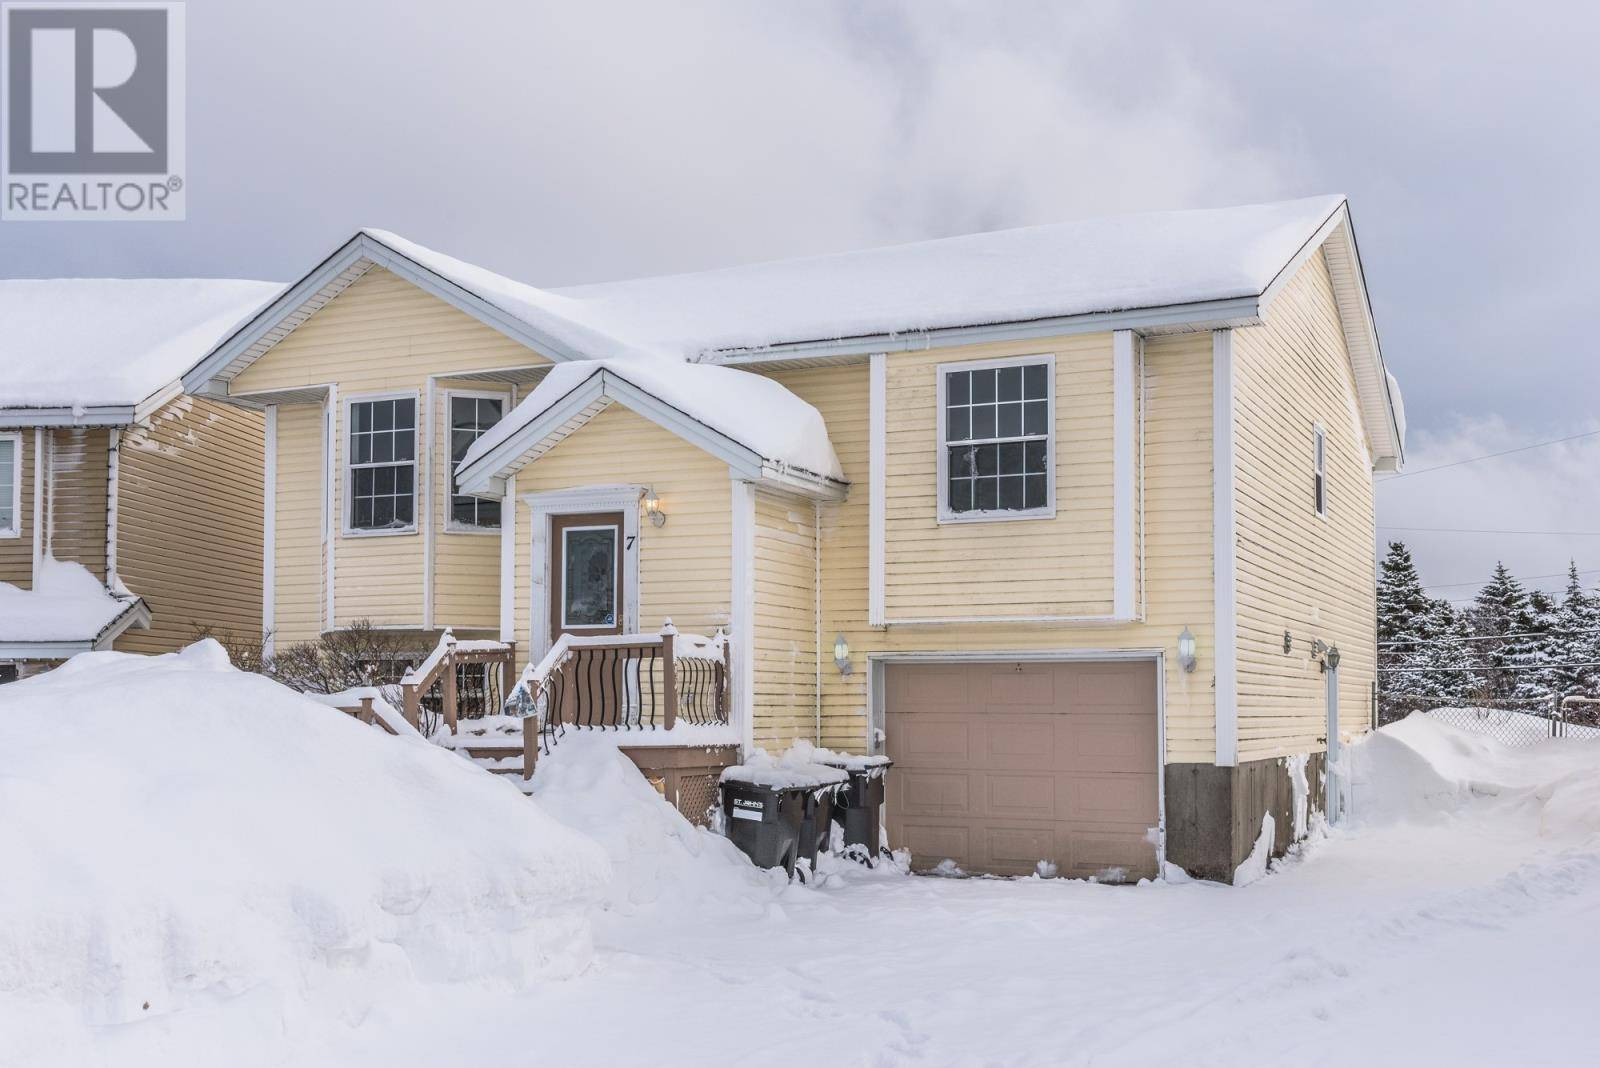 House for sale at 7 Gairlock St St. John's Newfoundland - MLS: 1209334